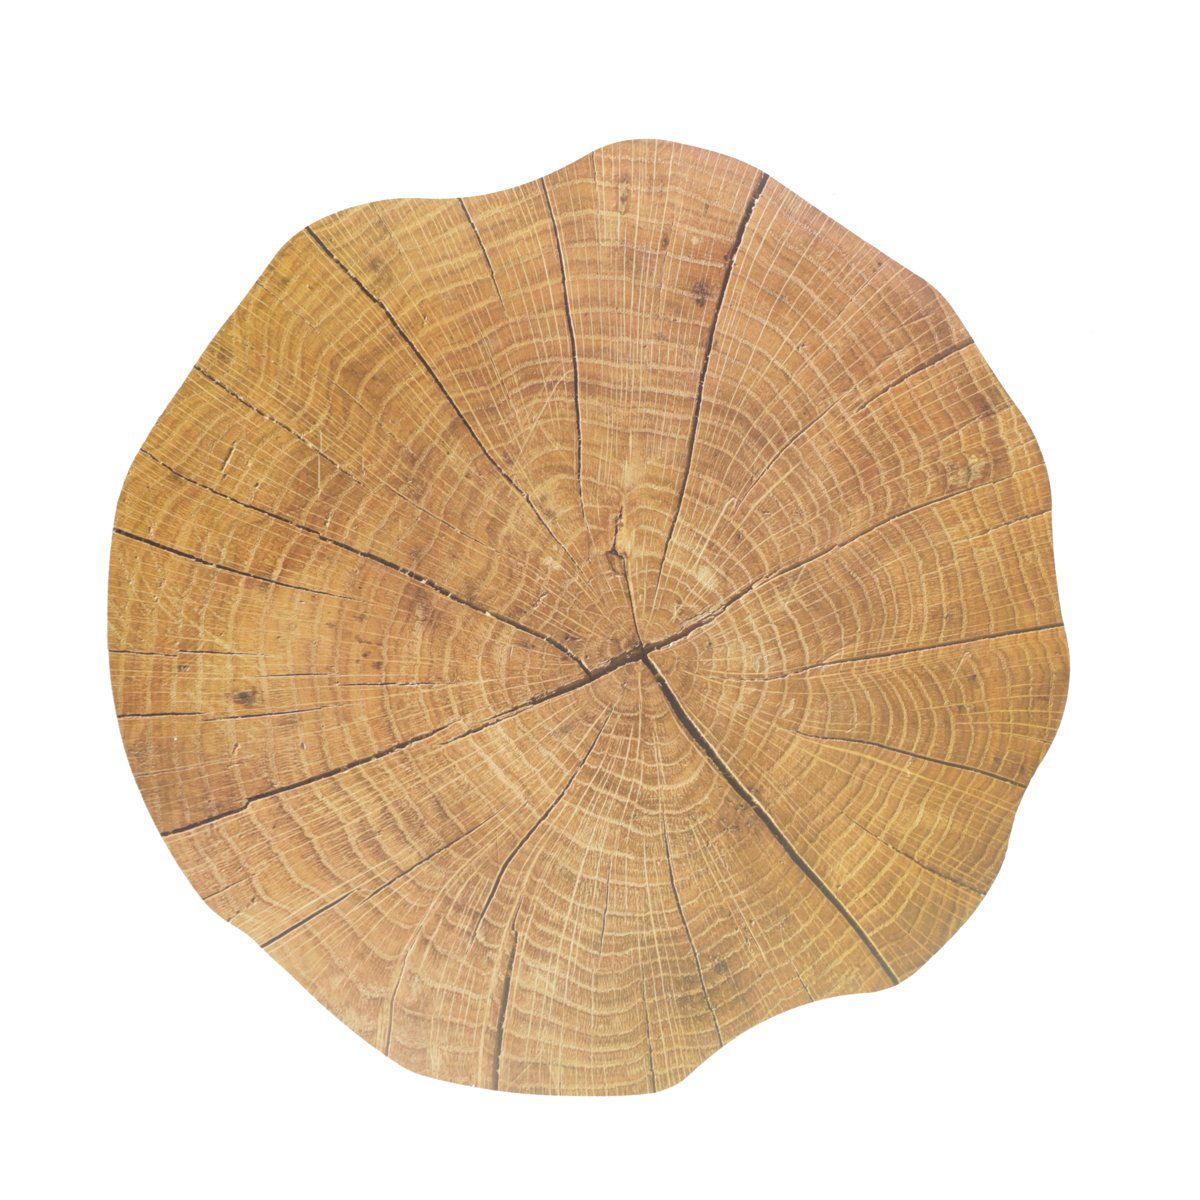 Jogo americano 38 cm de cortiça bege Autumn Lyor - L66895